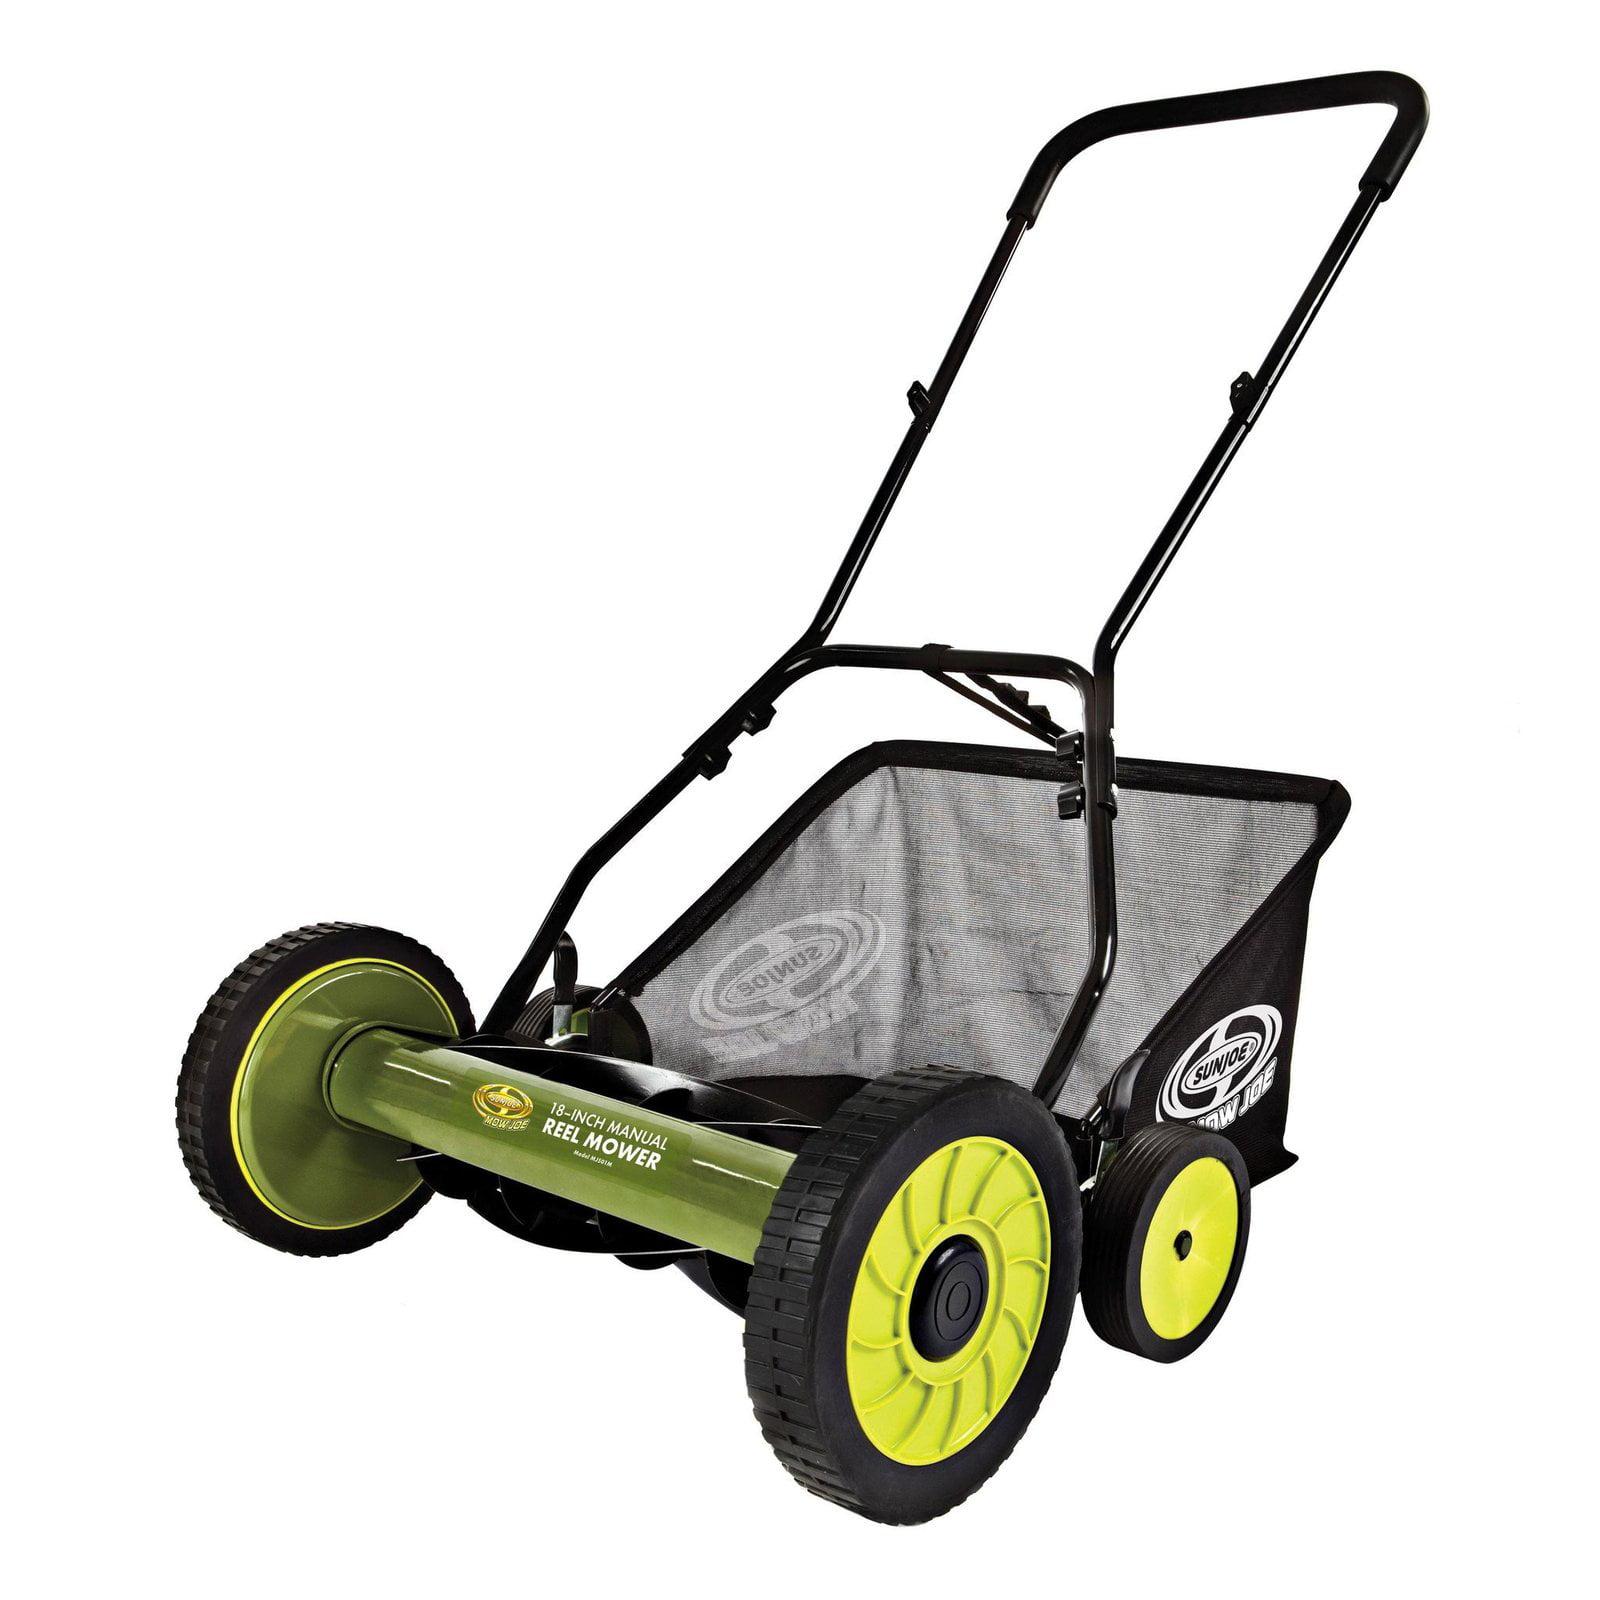 Sun Joe MJ501M Mow Joe 18 in. Manual Reel Mower with Grass Catcher by Snow Joe LLC